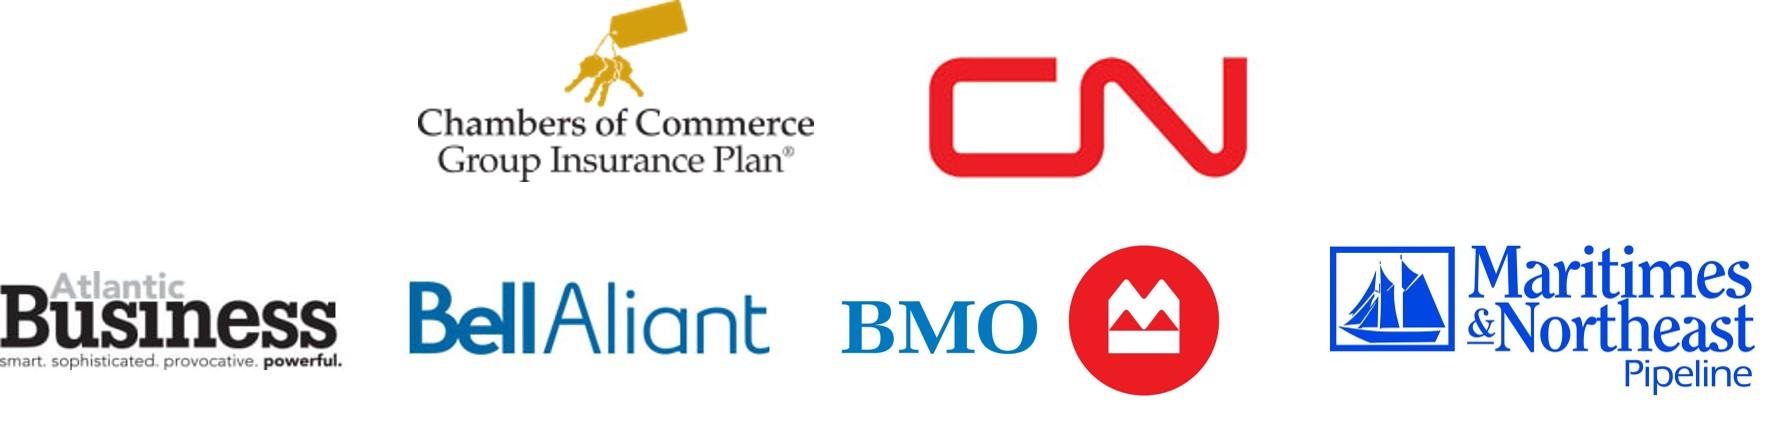 10-5k-Corp-partner-collage_website-DEC-3-18.png.jpg